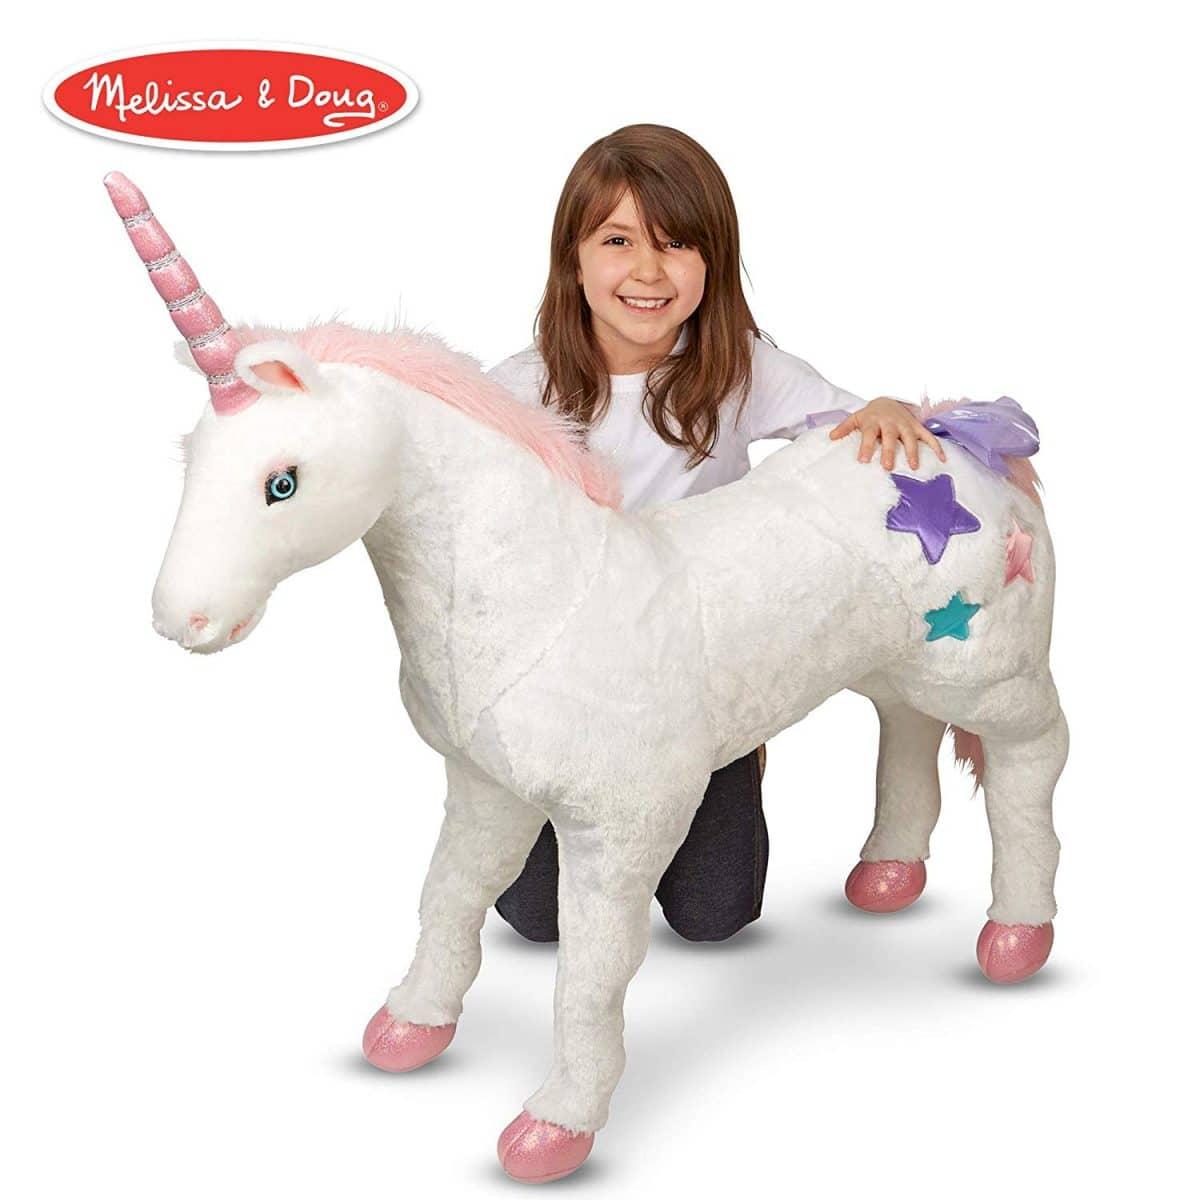 Superb Best Unicorn Toys For Kids To Buy 2019 Littleonemag Creativecarmelina Interior Chair Design Creativecarmelinacom